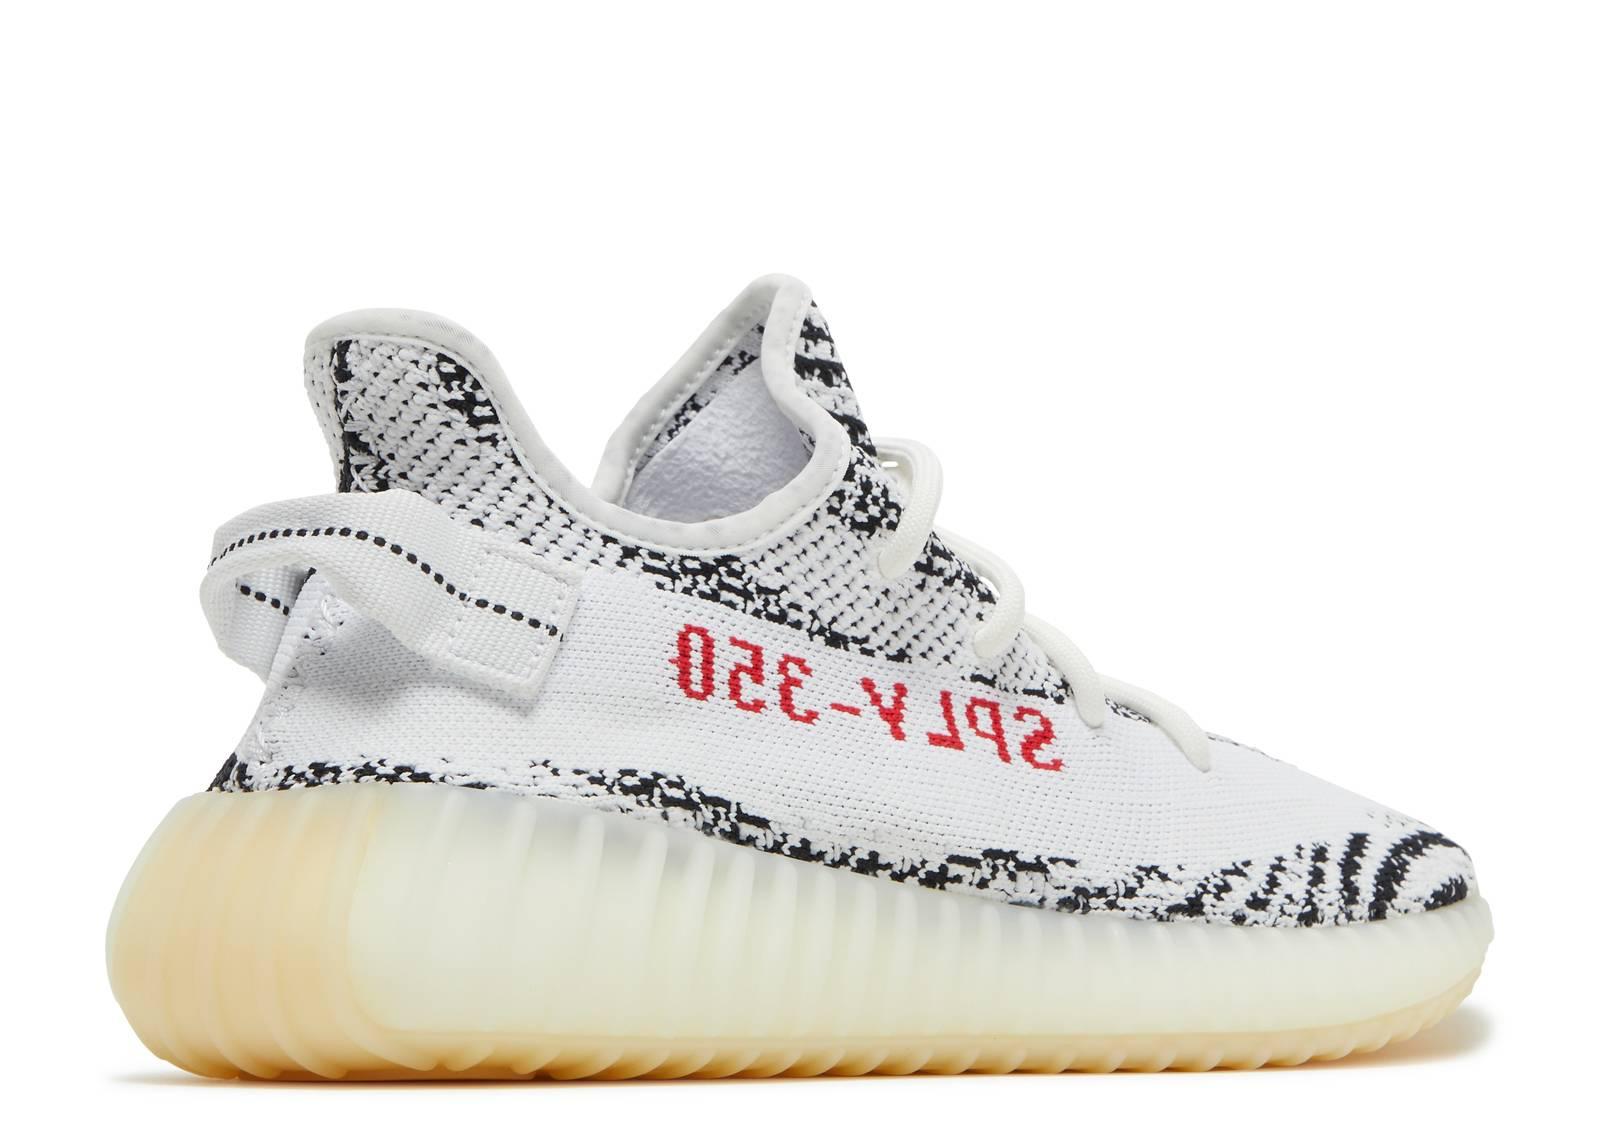 Brigantino Abuso isola  Yeezy Boost 350 V2 'Zebra' - Adidas - CP9654 - white/core black/red |  Flight Club